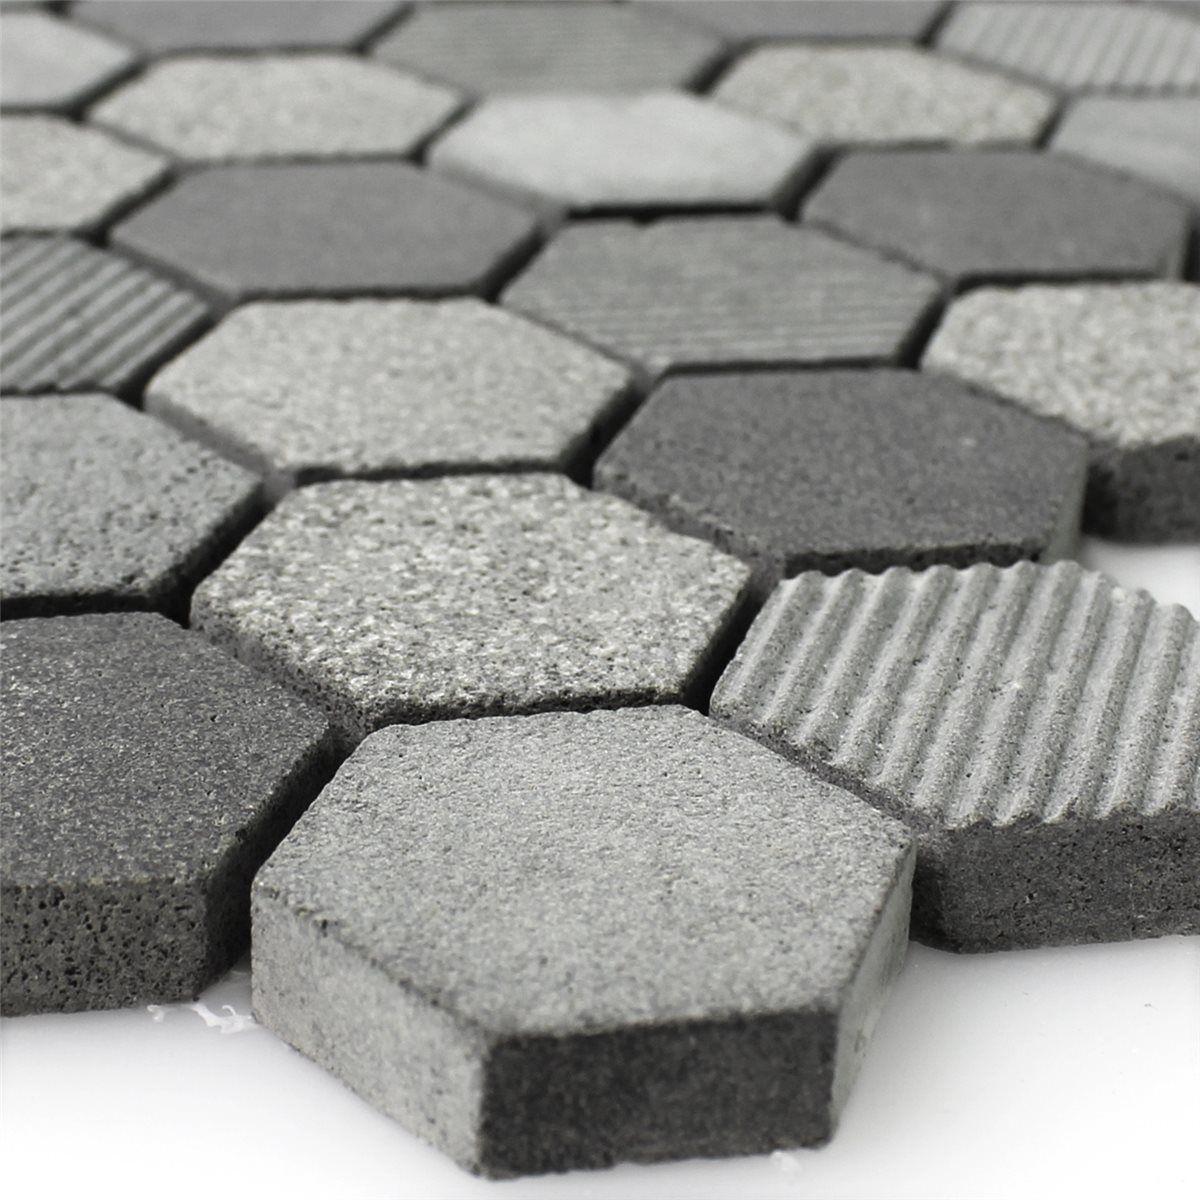 Natural Stone Hexagon Mosaic Tiles Notte Anthracite